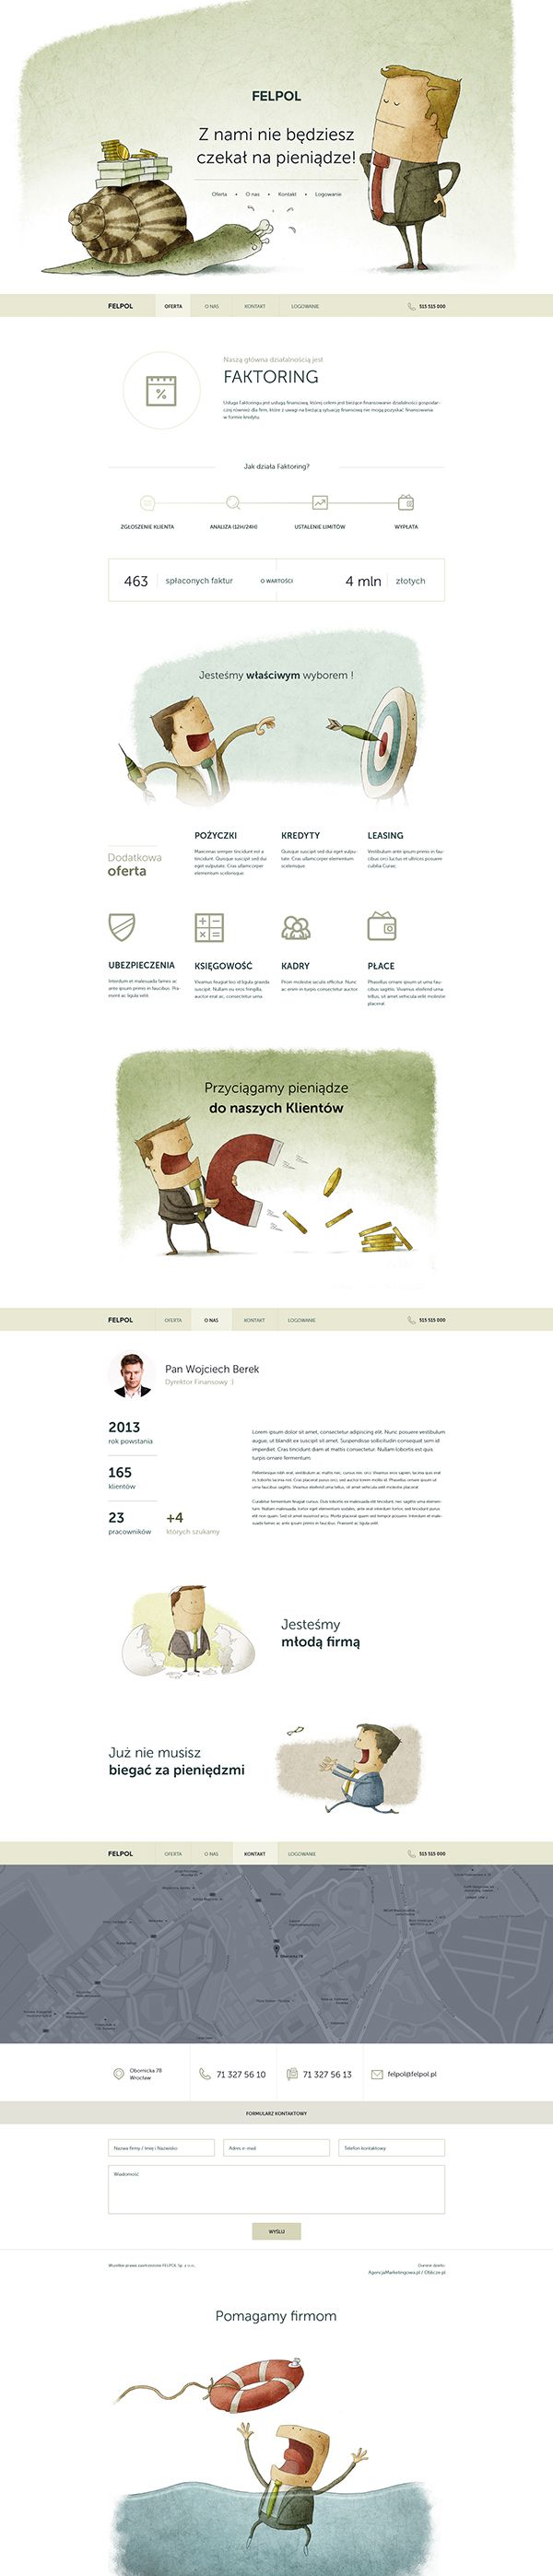 Finance company website's comic version :)